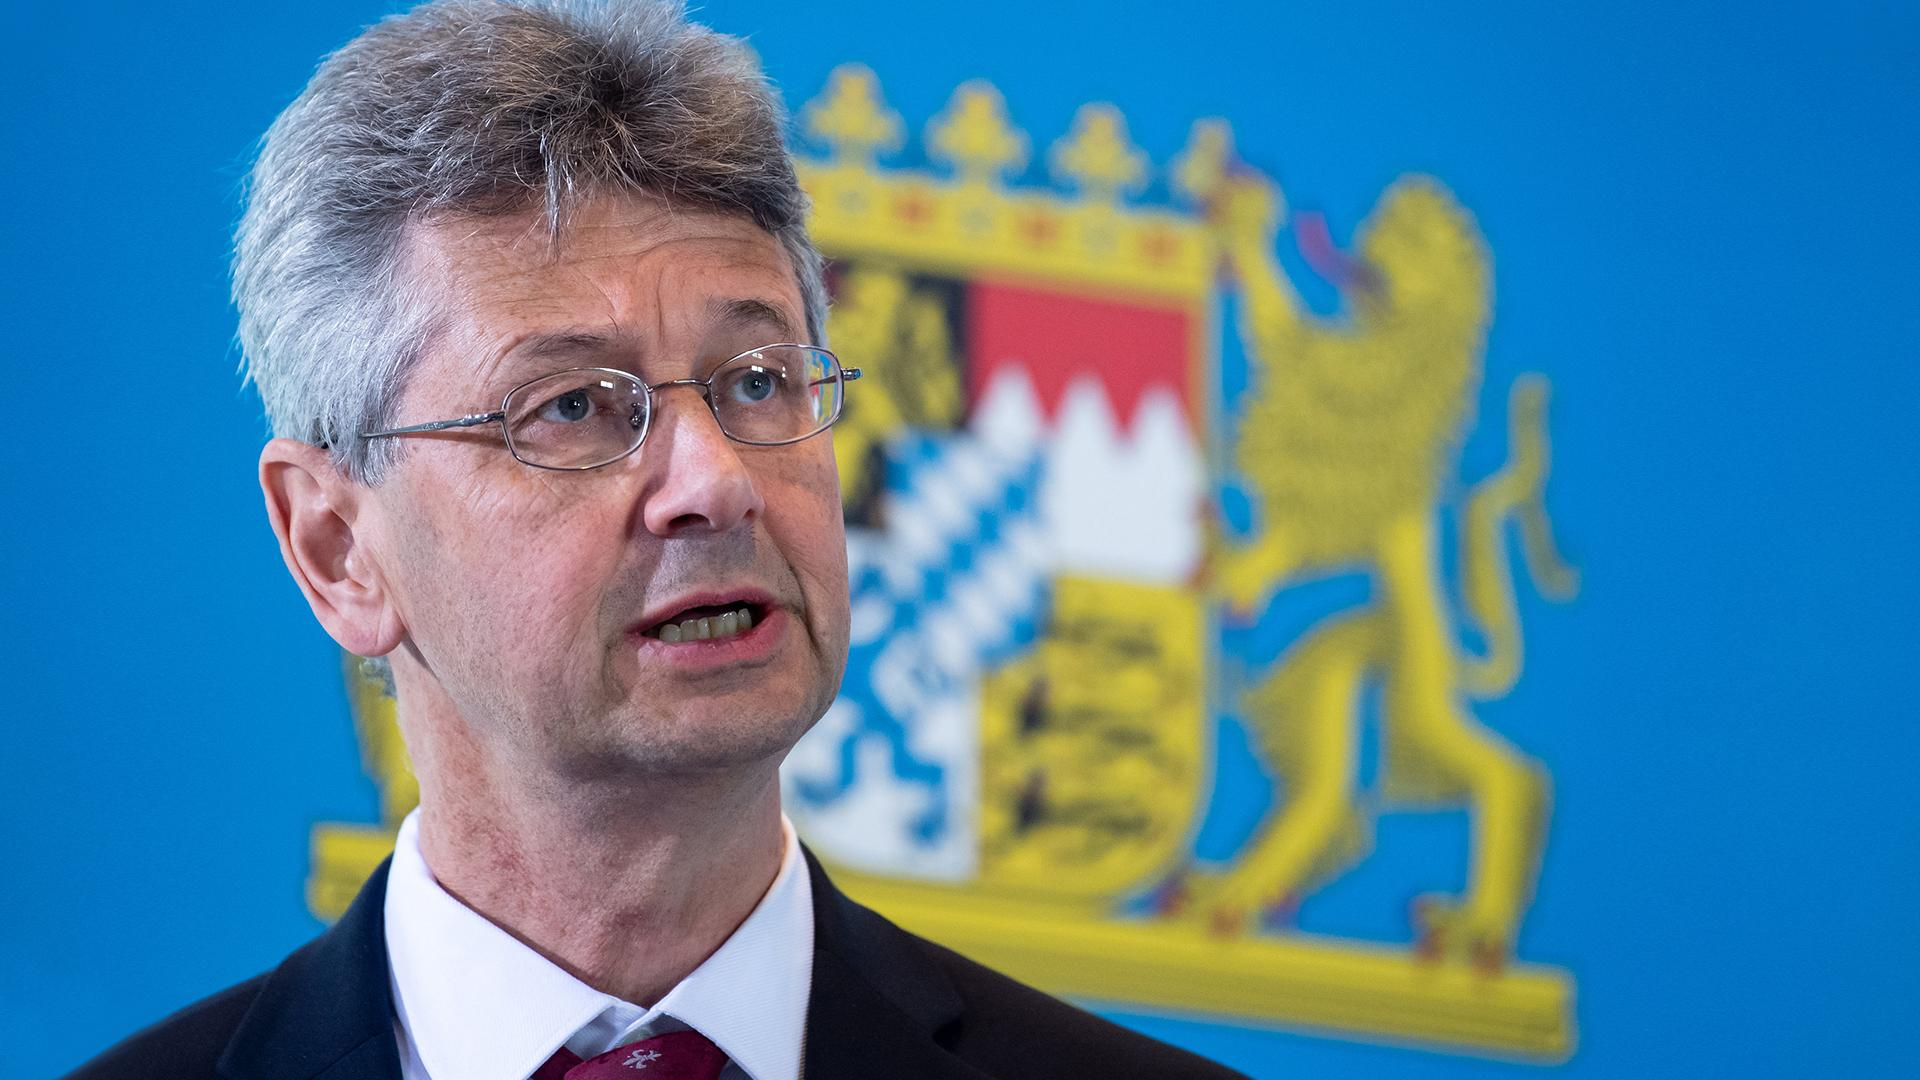 Kultusminister Michael Piazolo